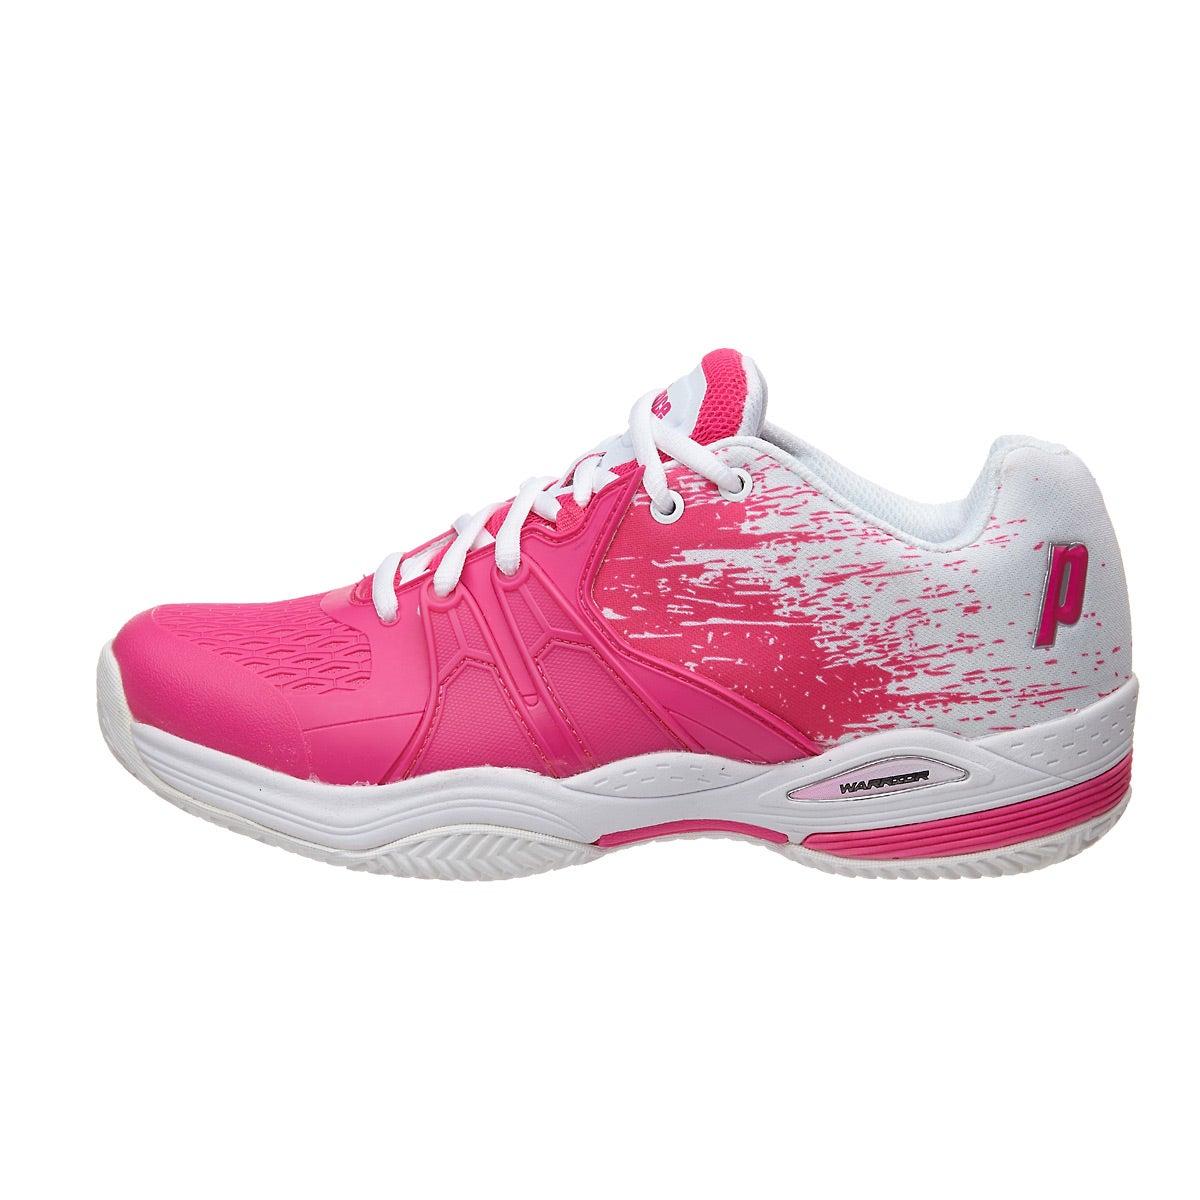 Prince Womens Tennis Shoes